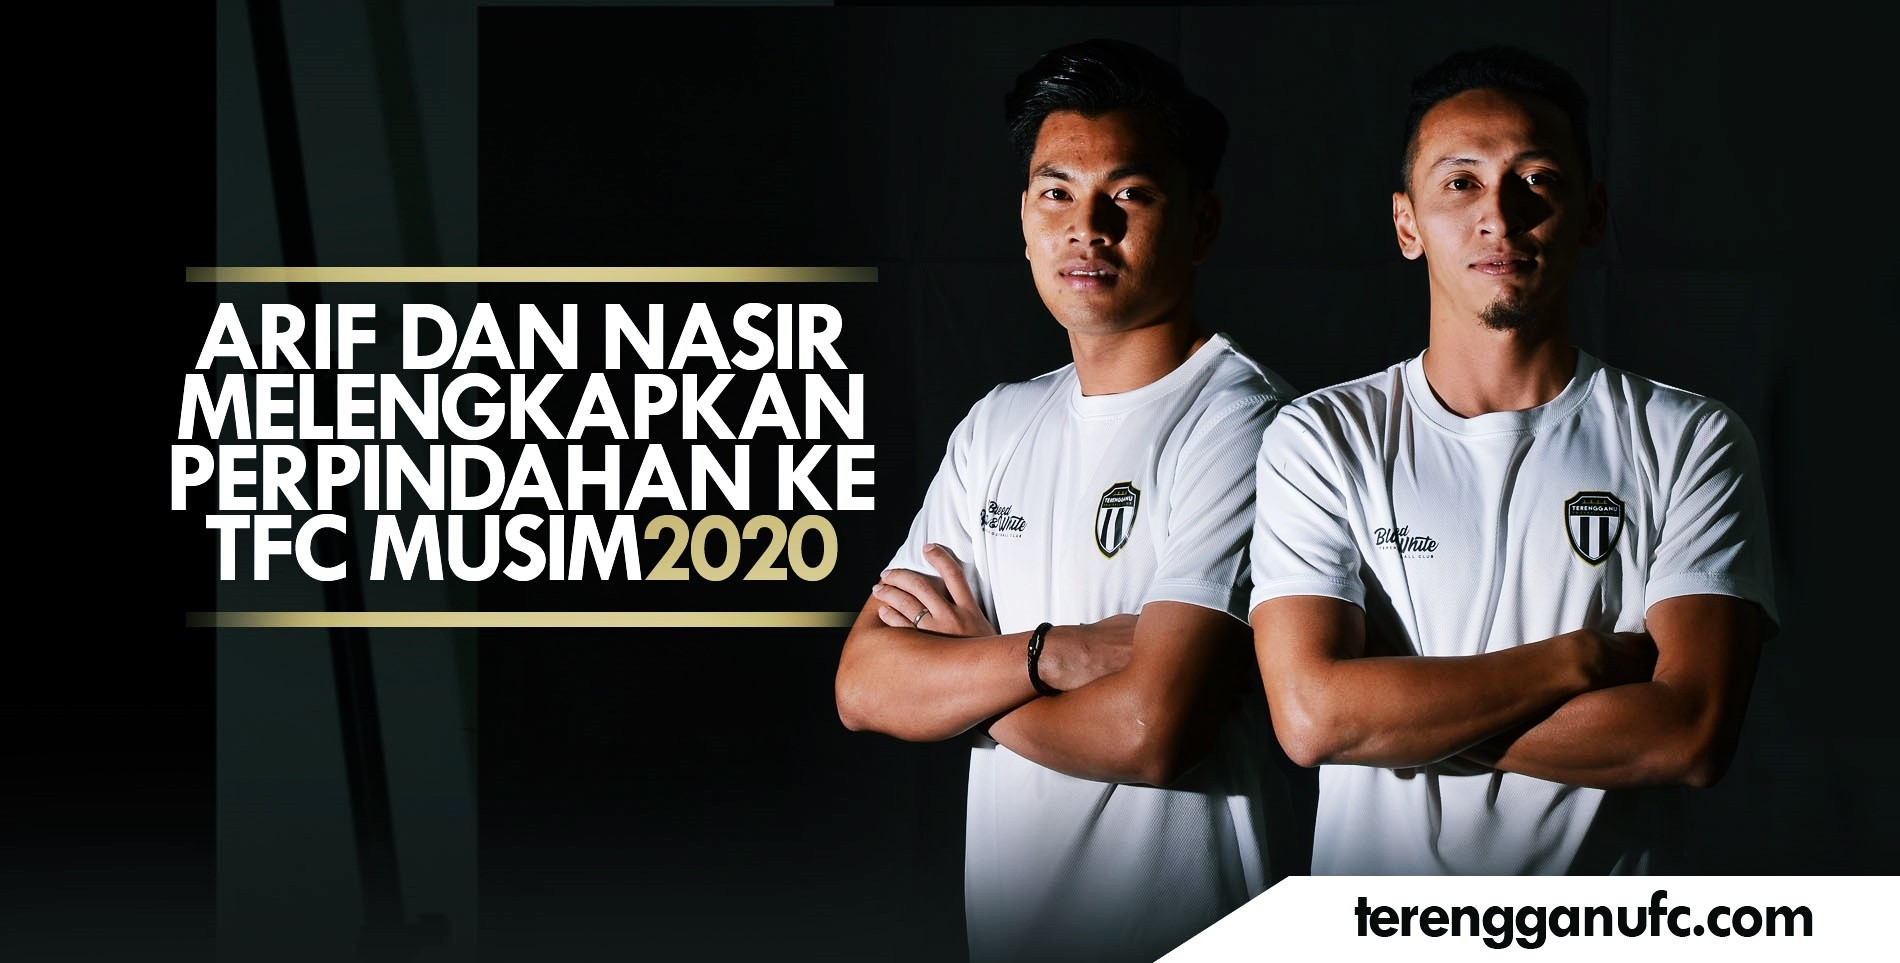 NASIR BASHARUDIN DAN ARIF FADZILAH MELENGKAPKAN PERPINDAHAN BAGI MUSIM 2020